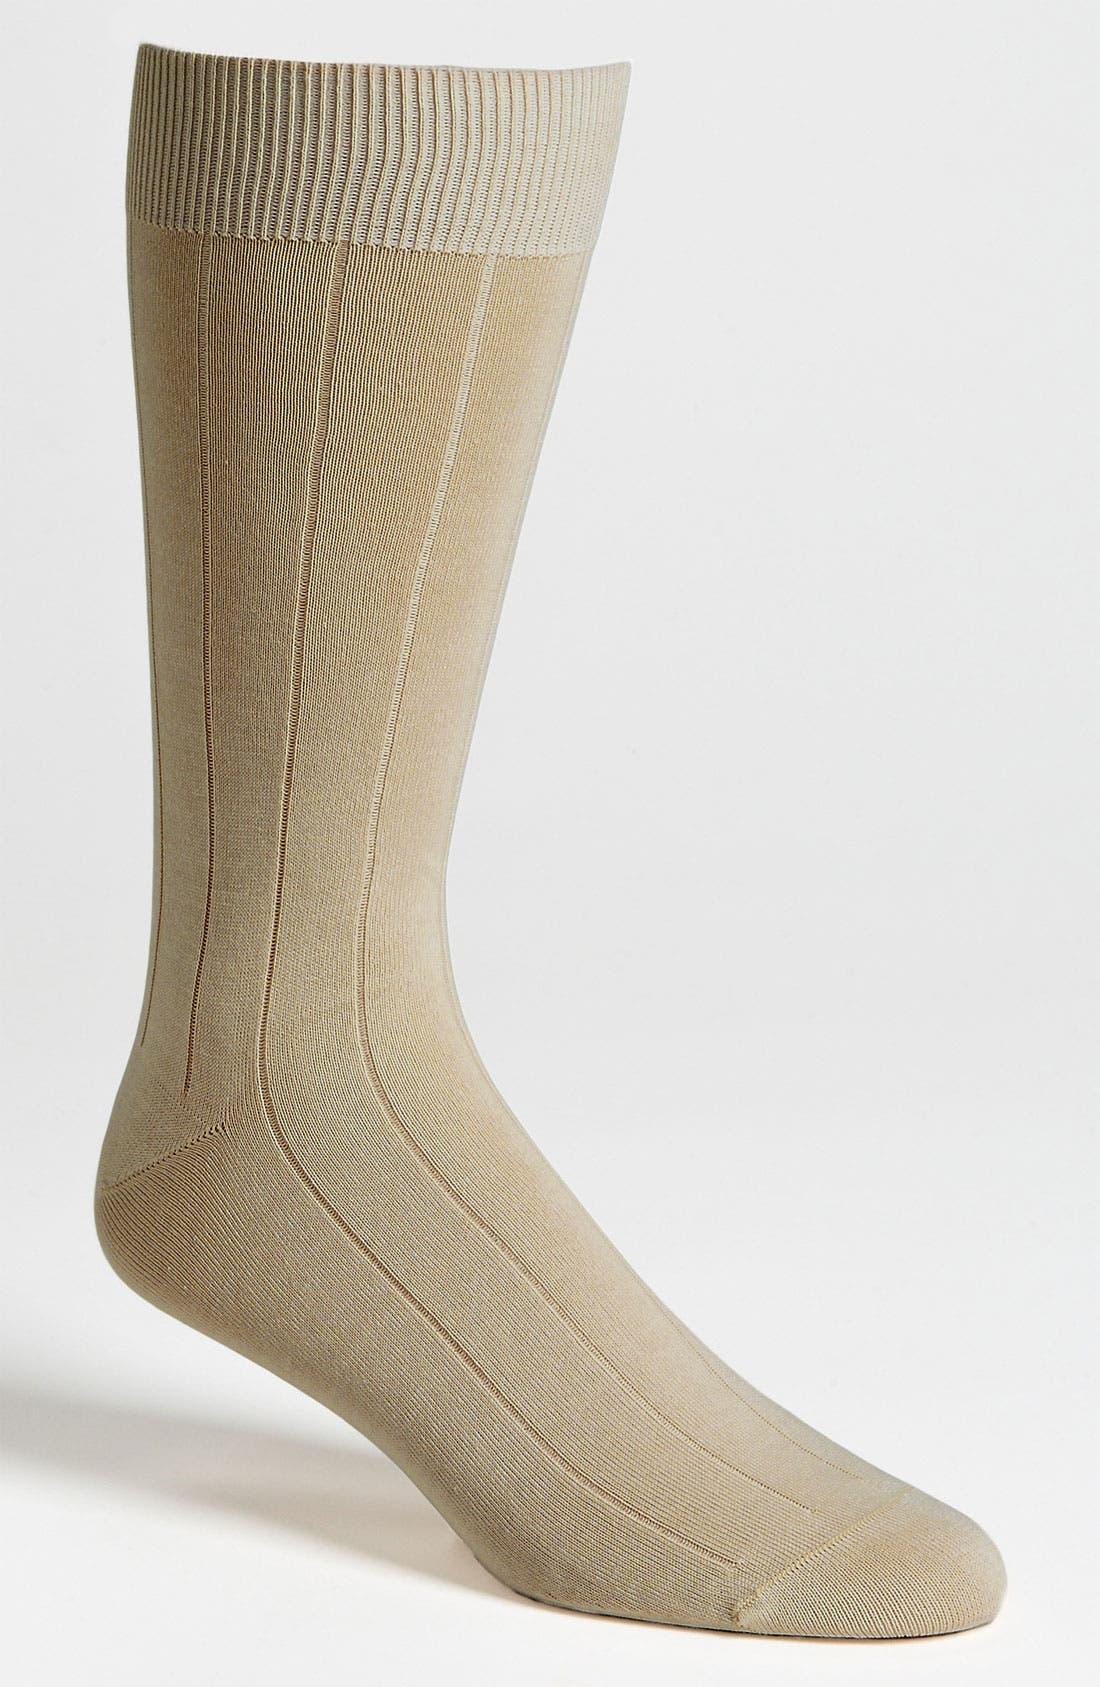 Alternate Image 1 Selected - Pantherella Sea Island Cotton Socks